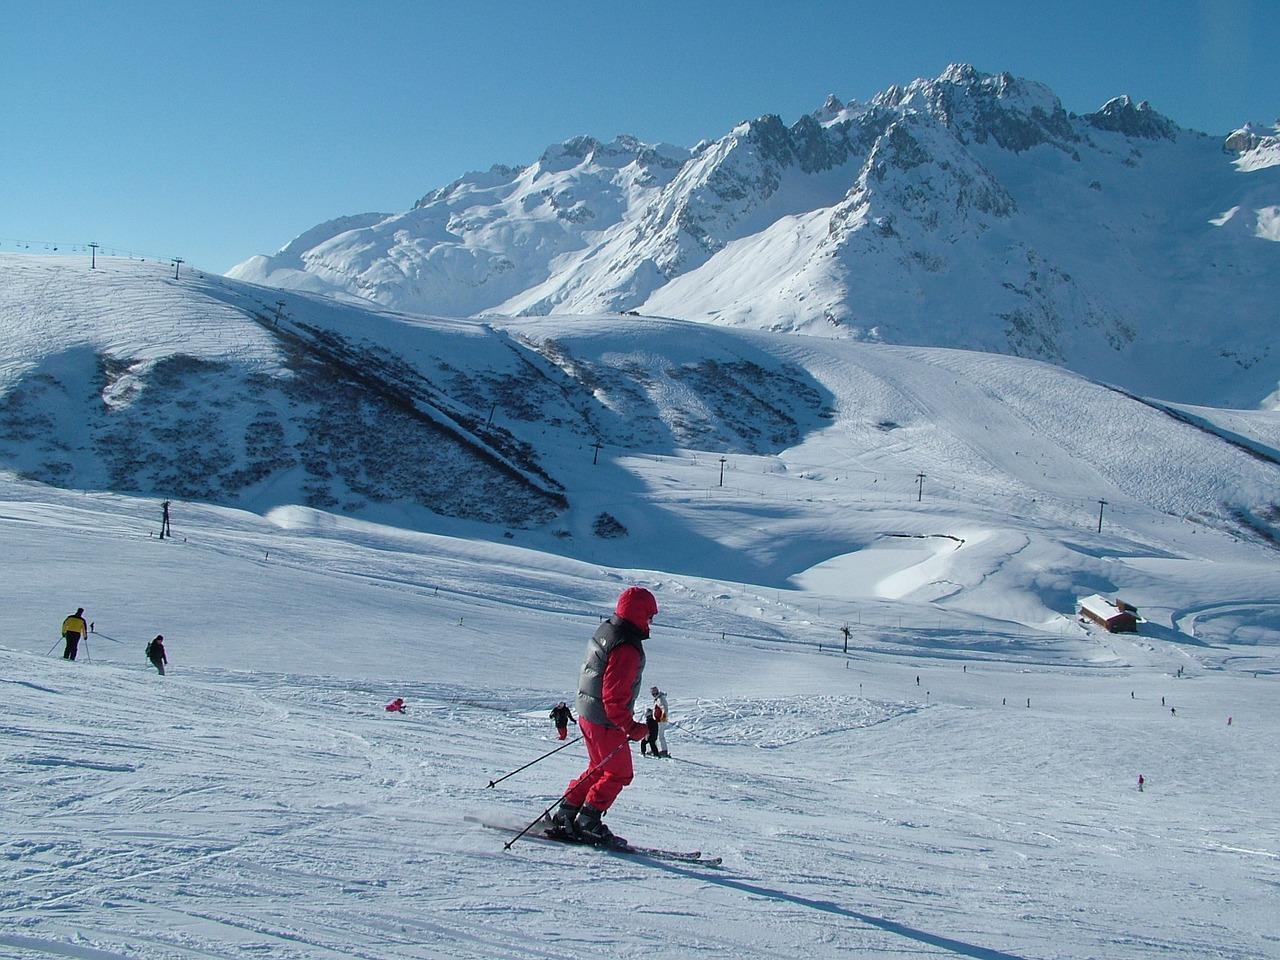 ski-679865_1280-1